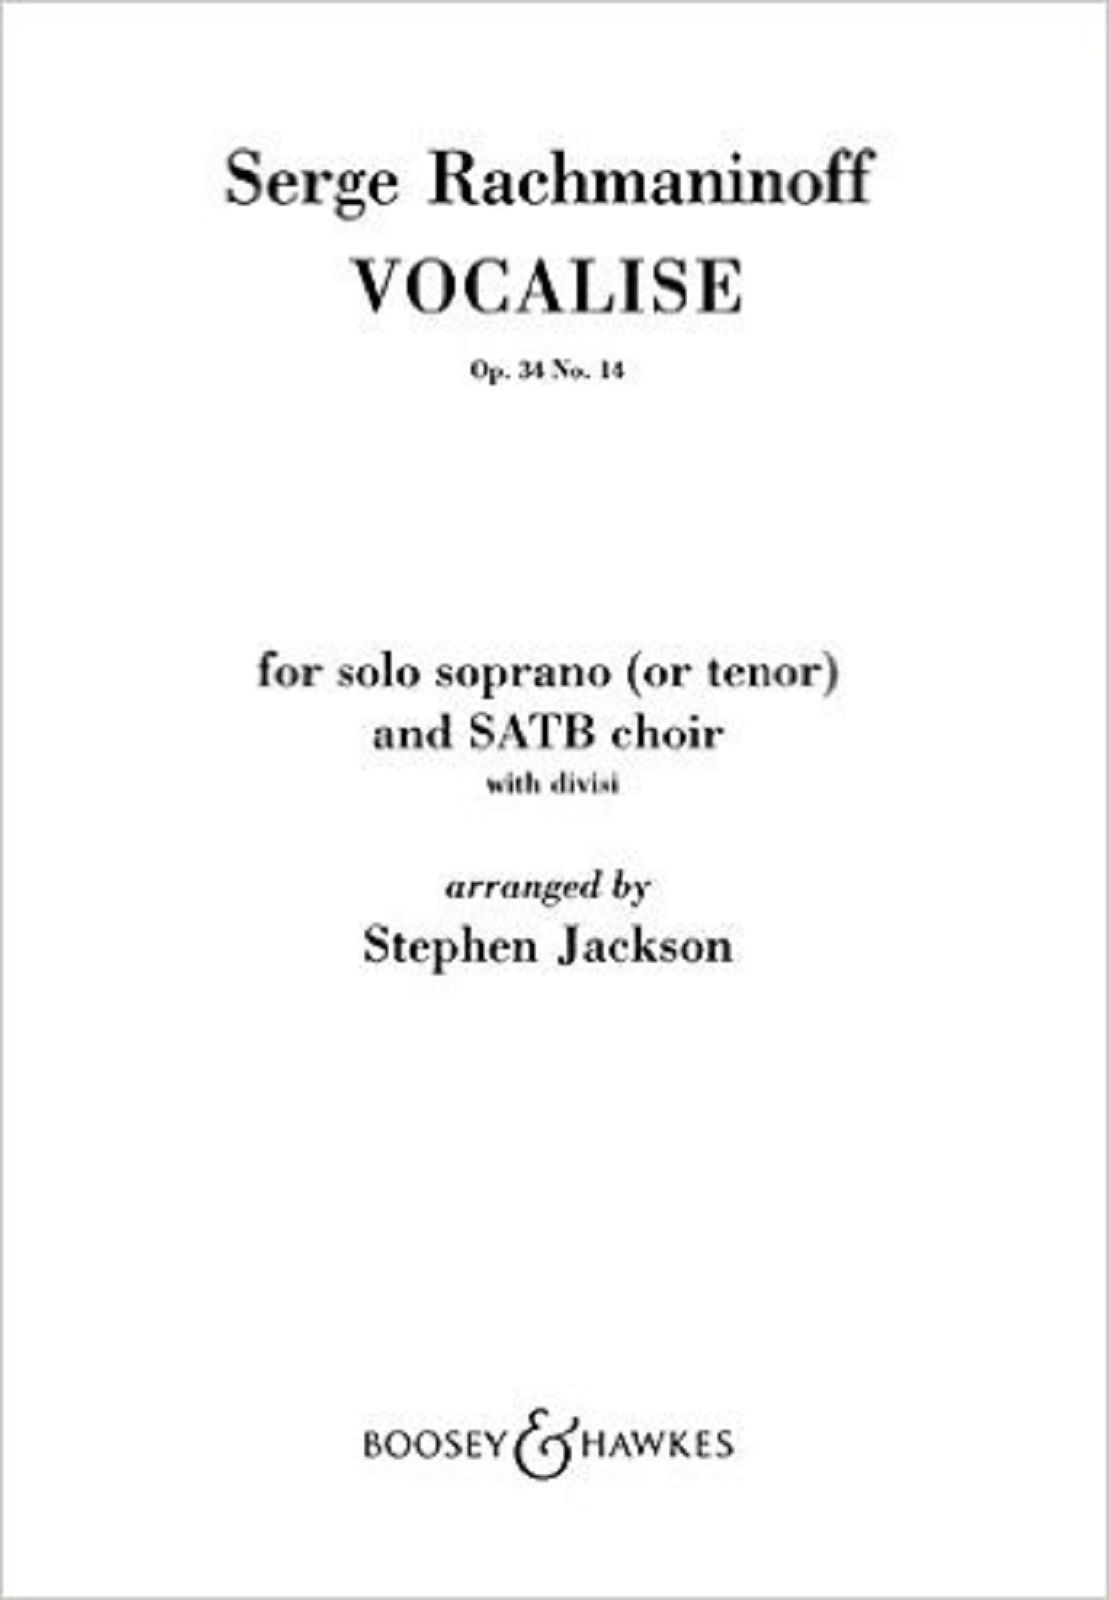 Serge Rachmaninoff Vocalise Op 34 No 14 Solo Soprano & SATB Choir Book B&H S126